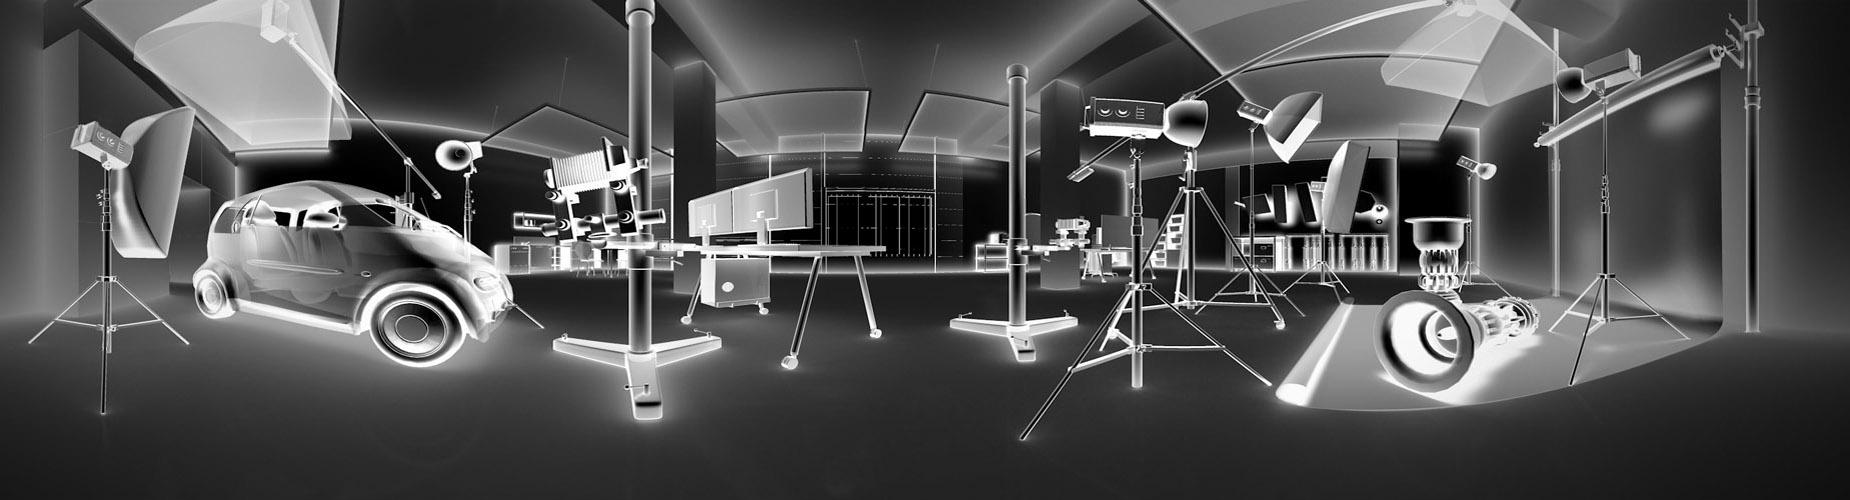 studio fokuspunkt berlin werbefotografie